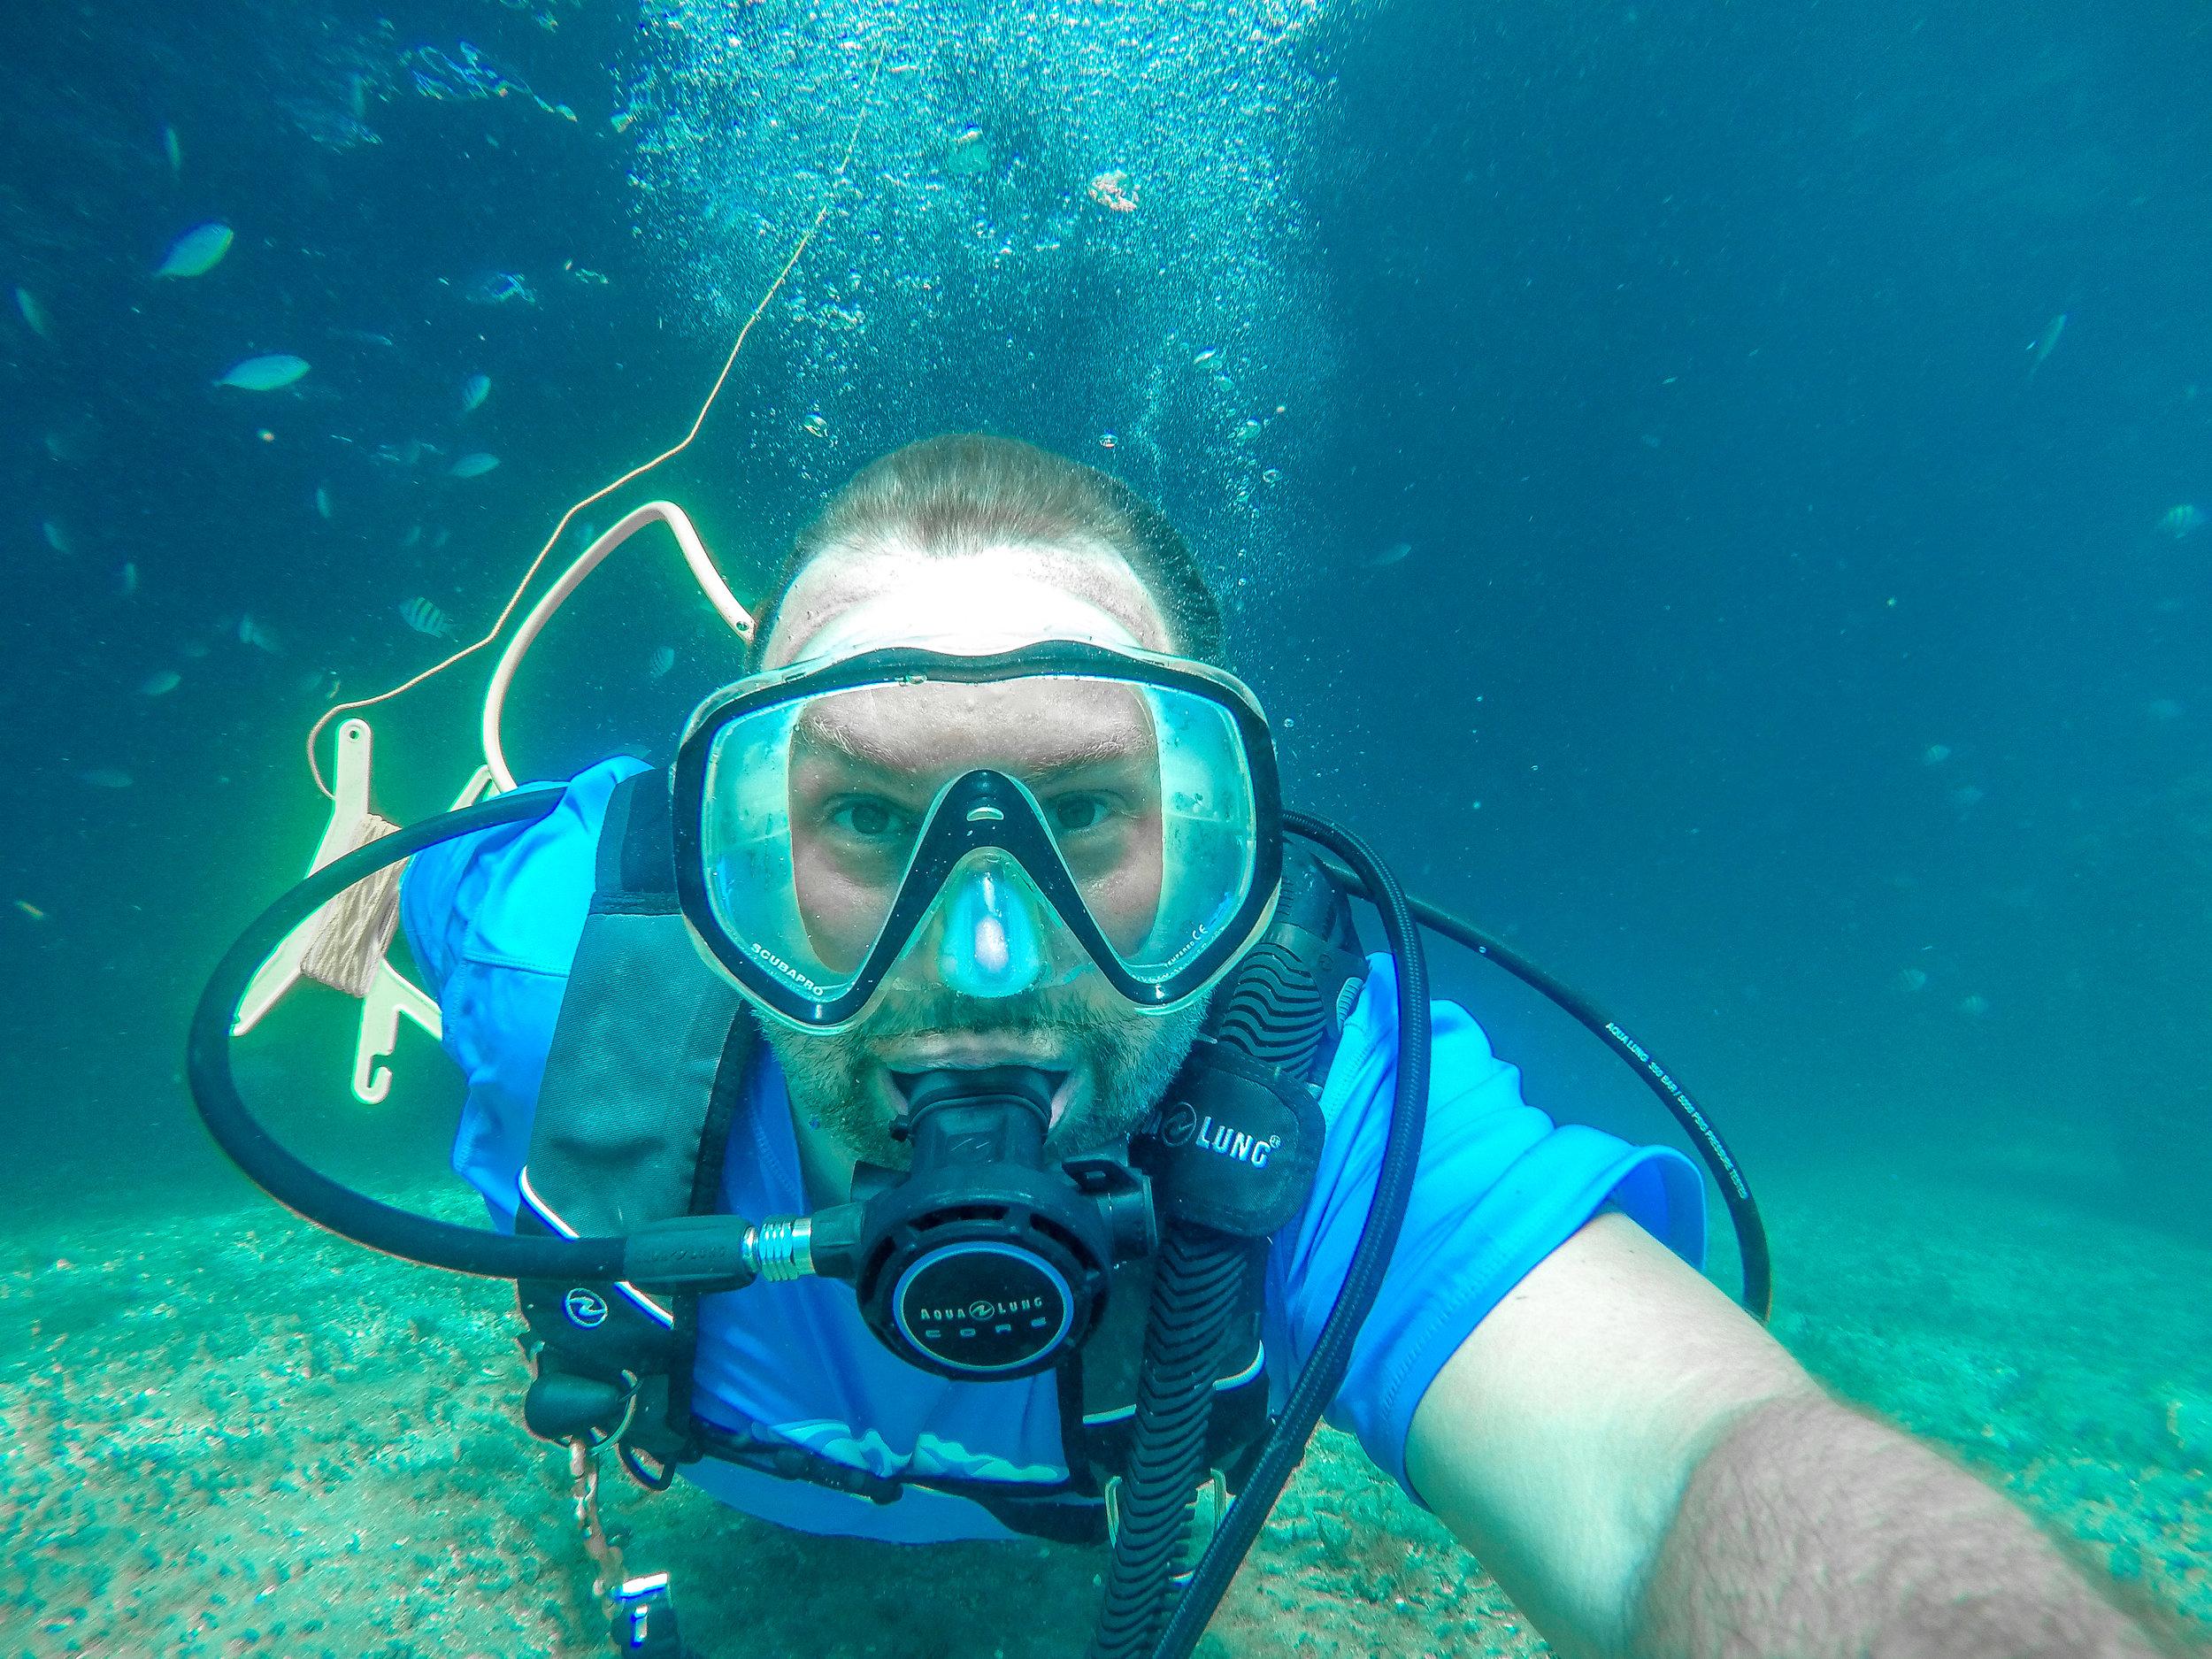 Diving the Blue Heron Bridge